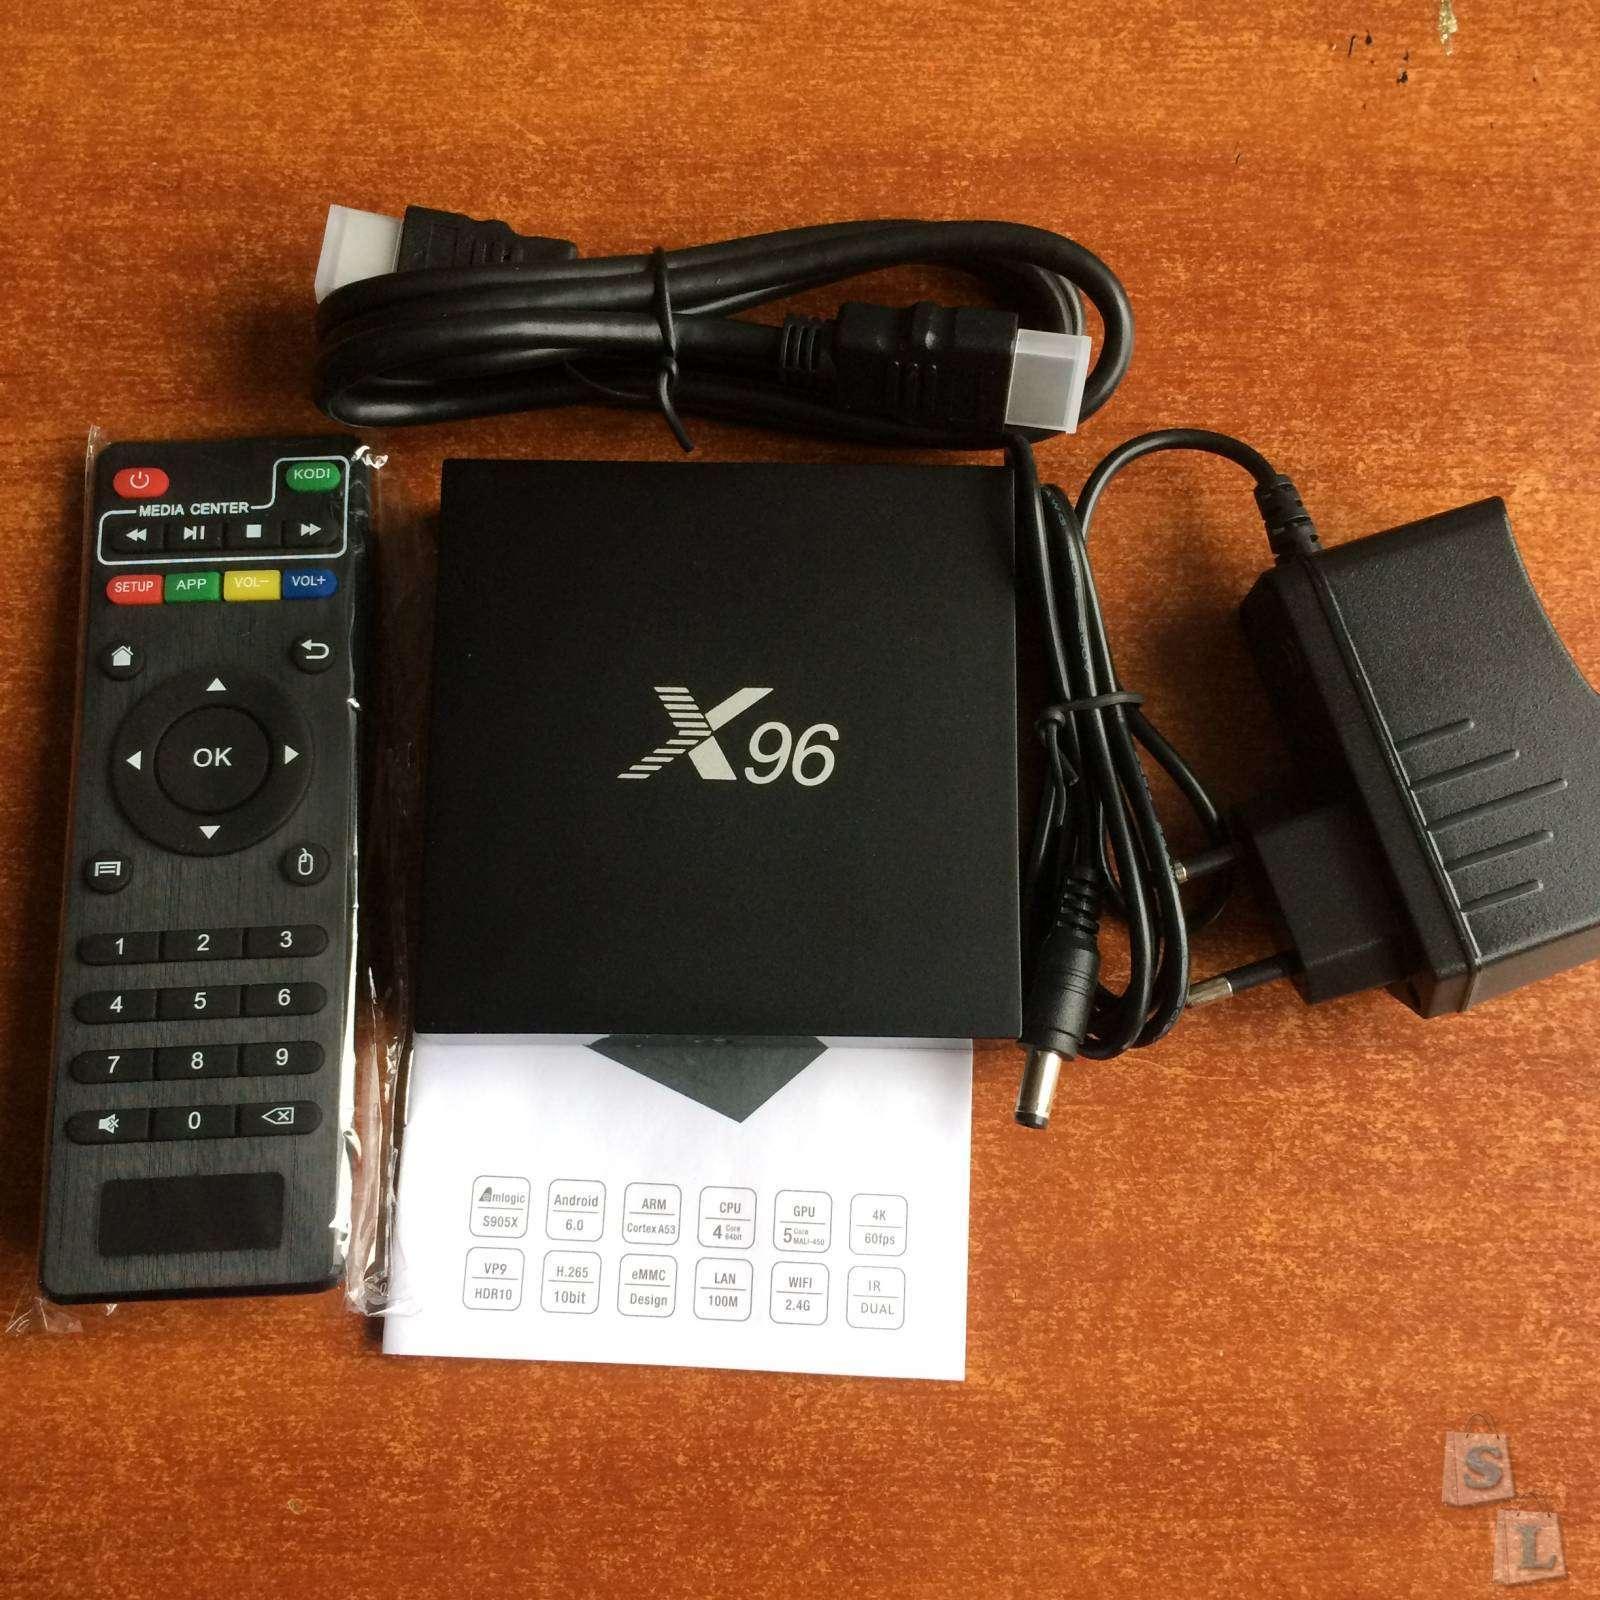 Banggood: ТВ бокс X96 на Amlogic s905x